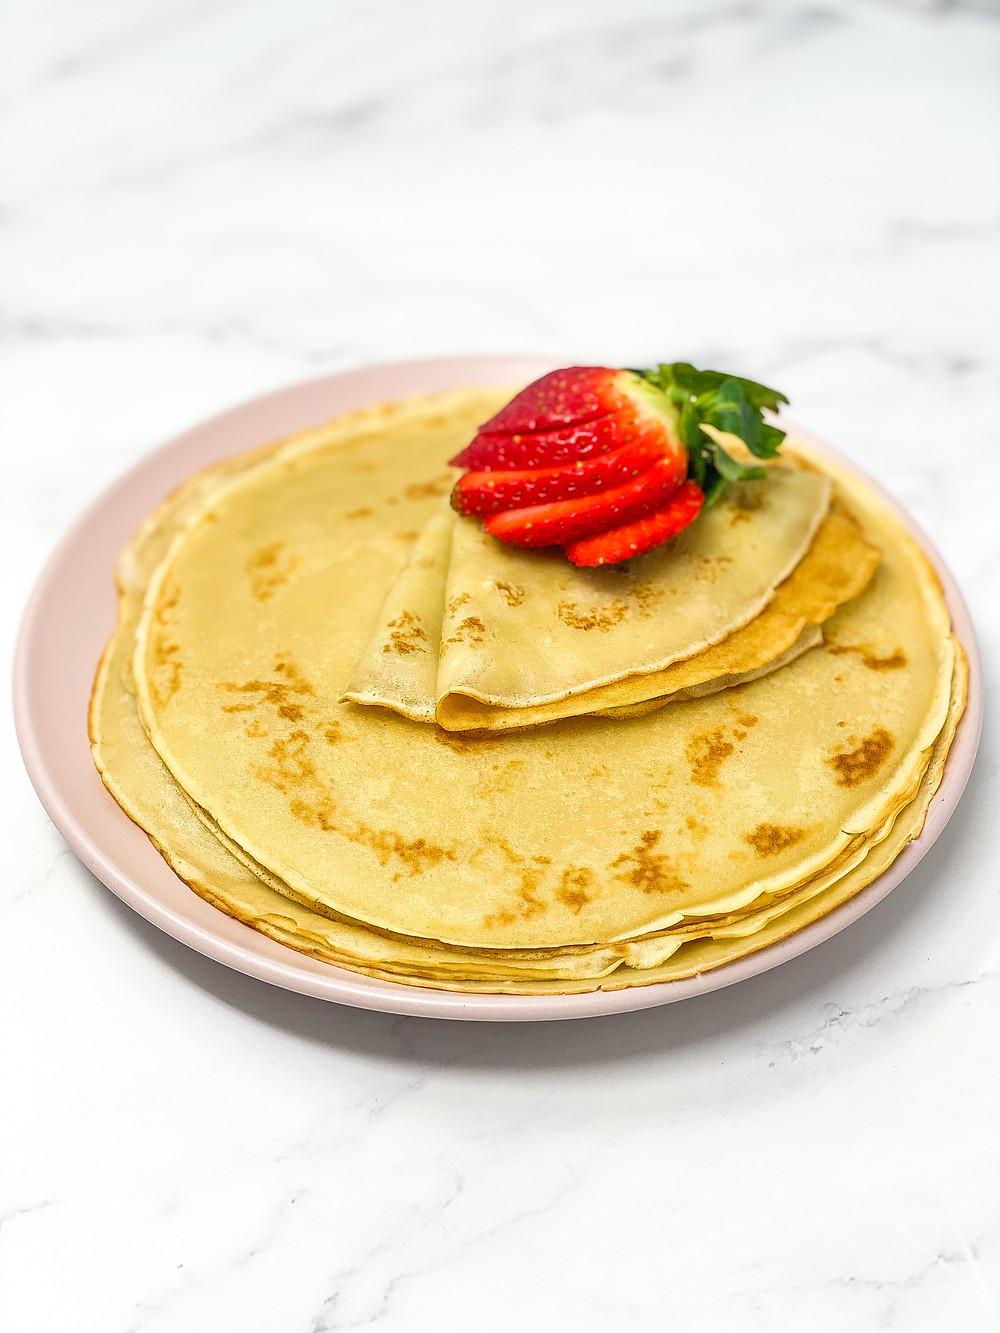 VEGAN CRÊPES with strawberry